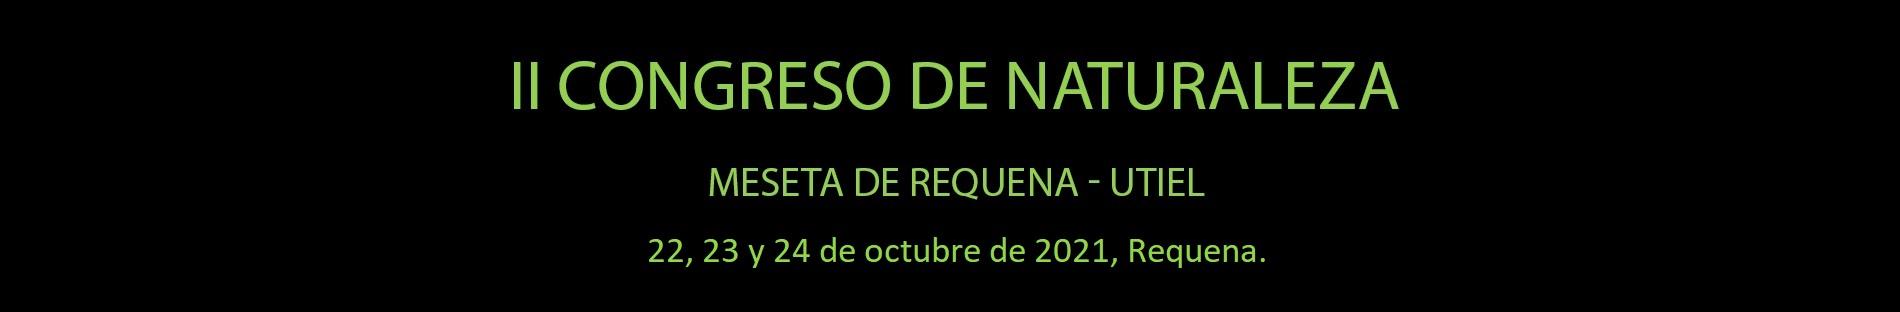 Congreso Naturaleza Requena-Utiel